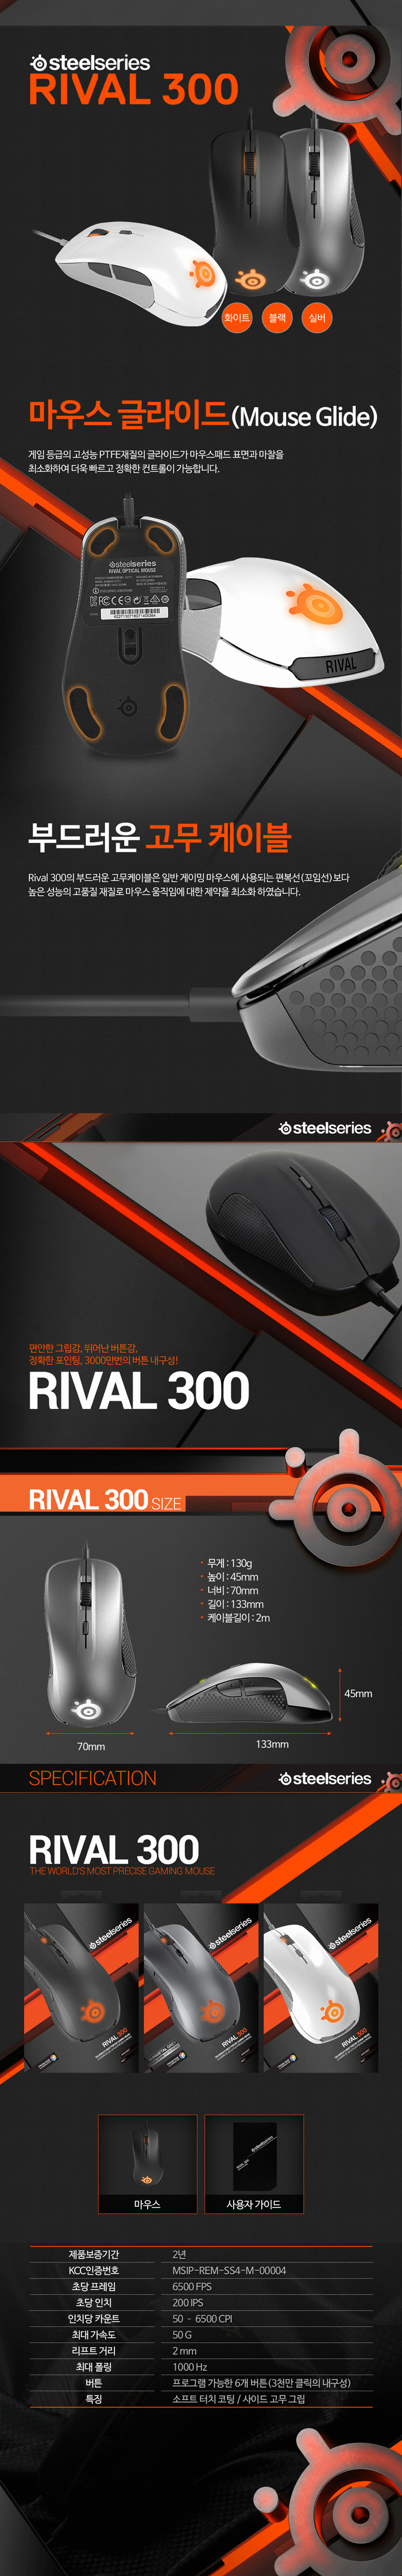 Rival300_3.jpg